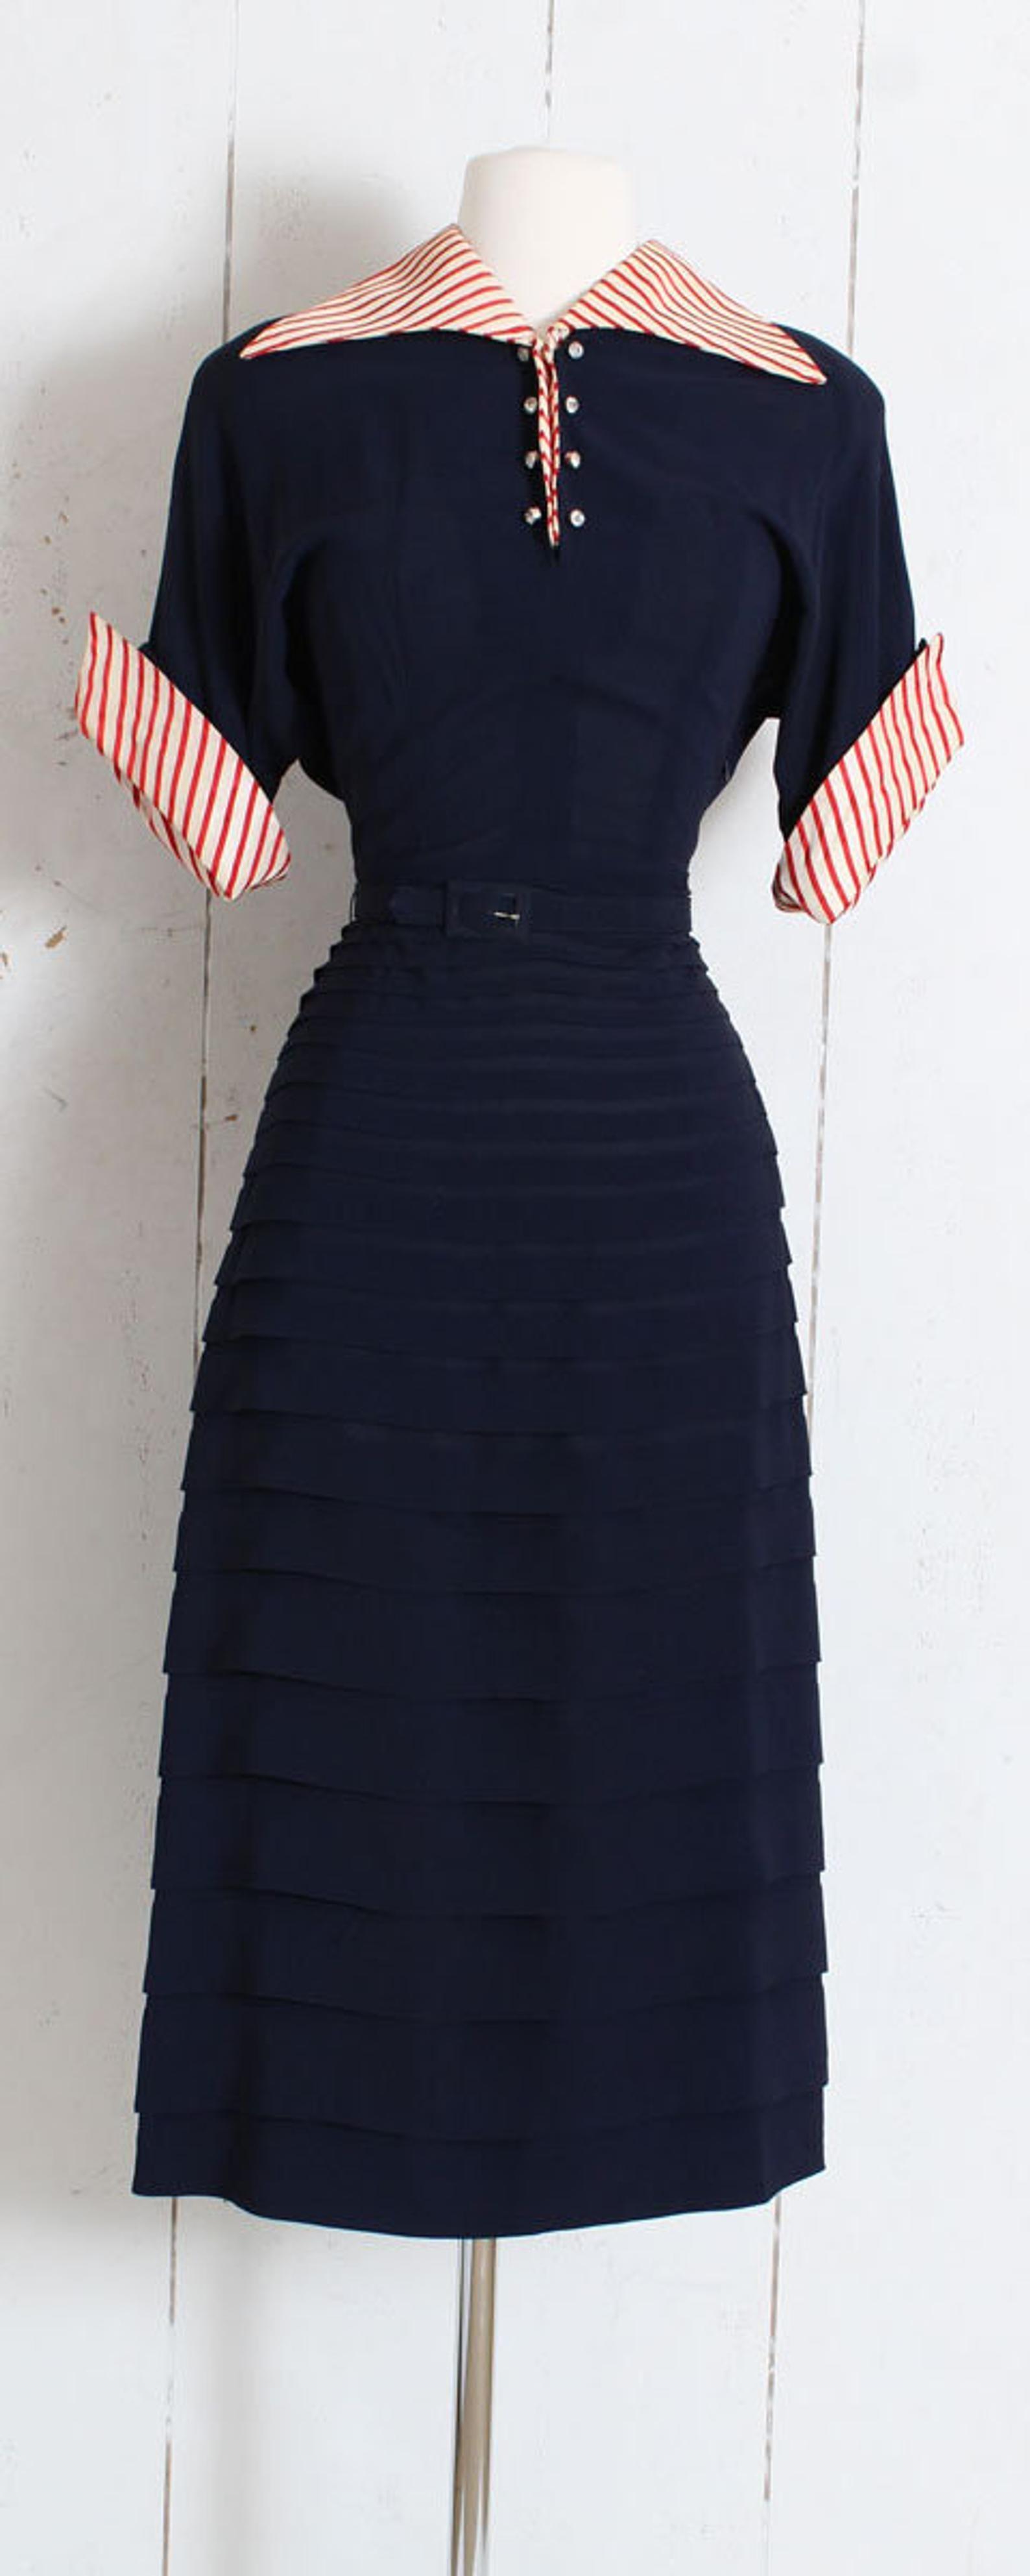 Vintage 1940s 40s Dress Blue Red Striped Rayon Crepe Sam Etsy 40s Dress 1940s Fashion 1940s Dresses [ 3970 x 1588 Pixel ]